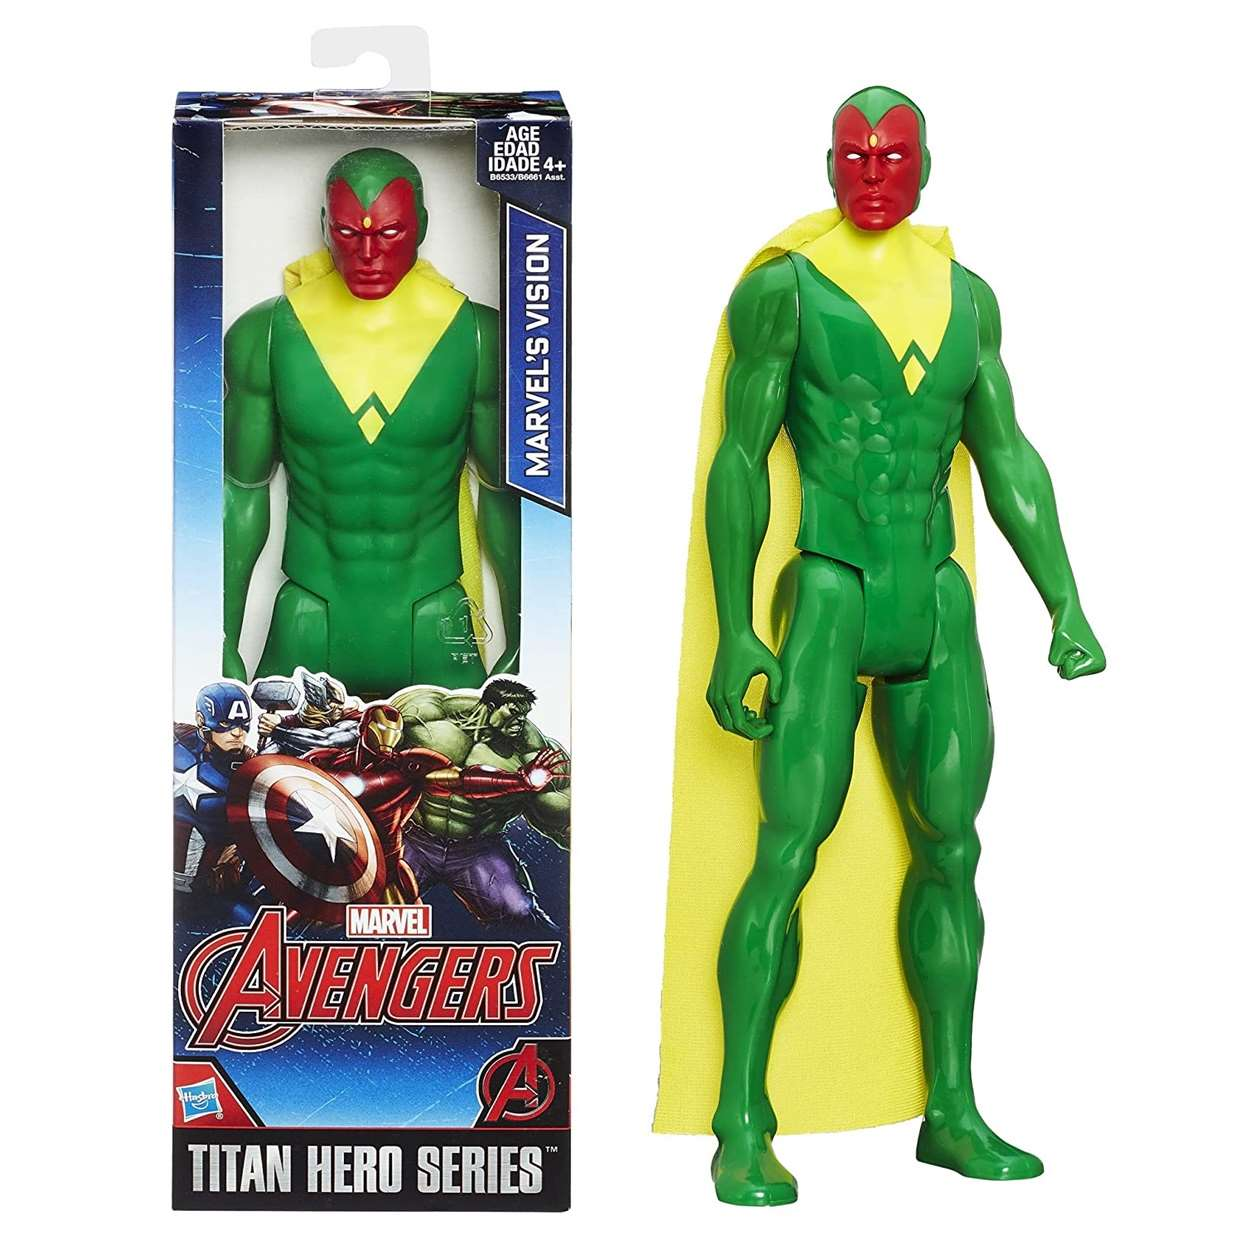 Visión Figura Avengers Initiative Titan Hero Series 12 PuLG